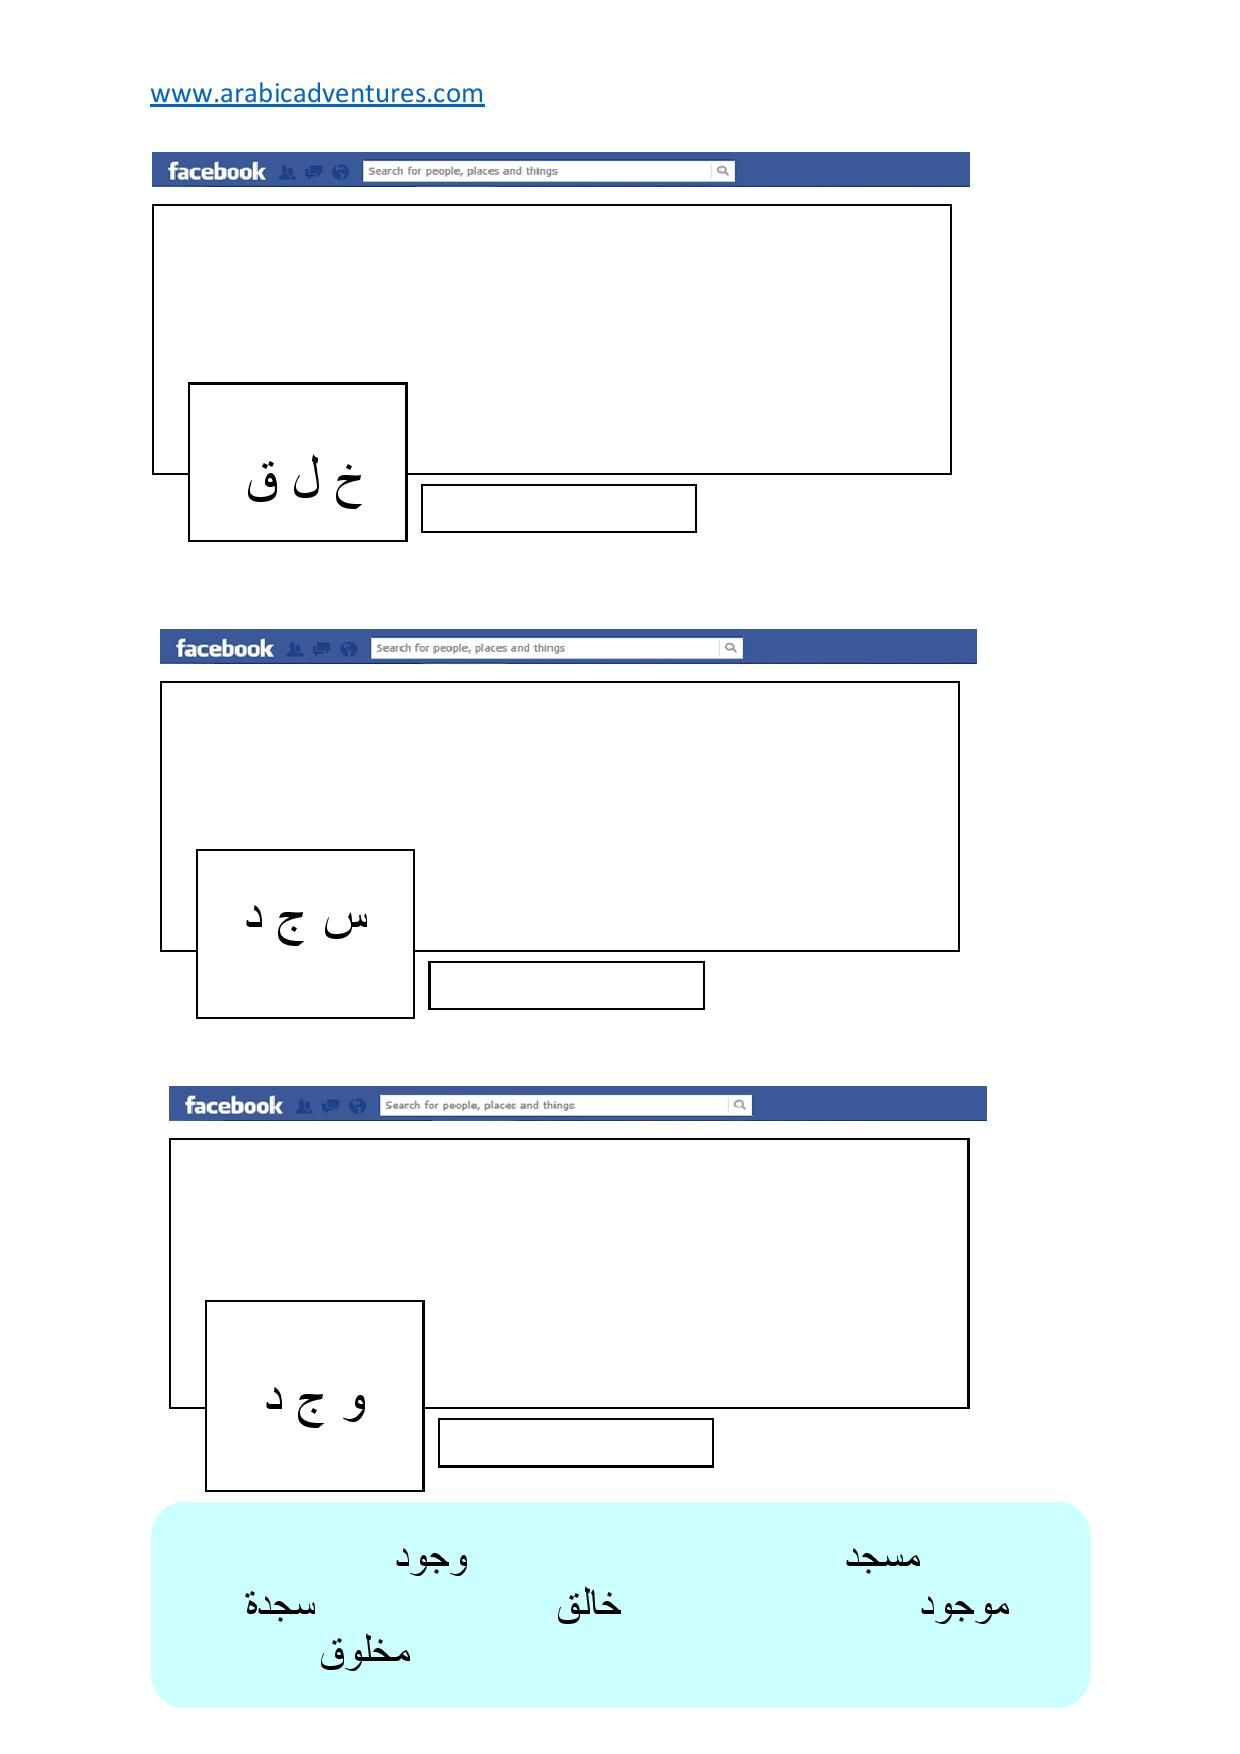 Arabic verbs root activity. Free pdf at www.arabicadventures.com ...